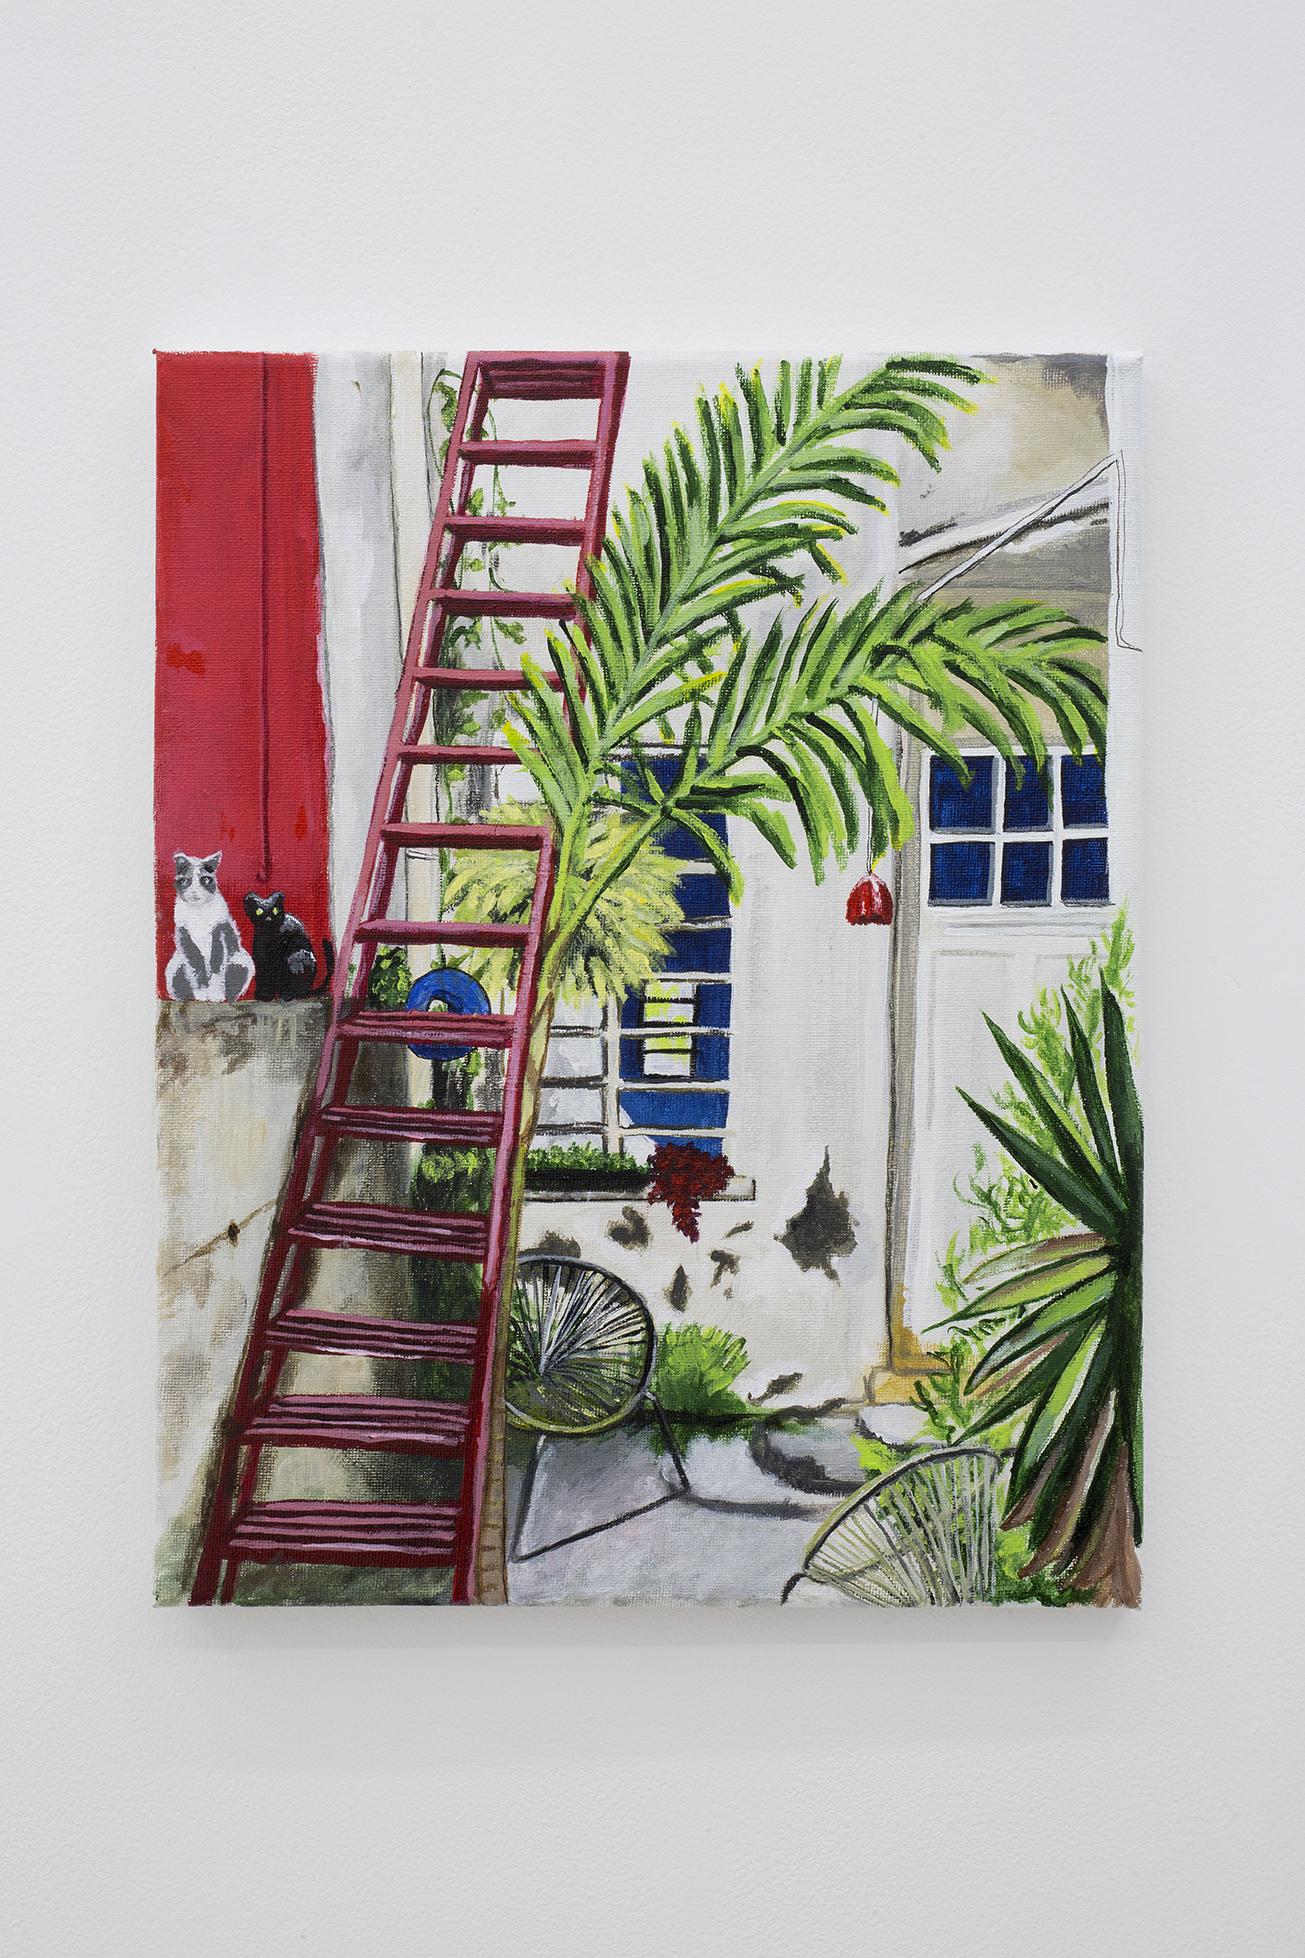 Shana Sharp, Los Gatos, 2018. Acrylic on canvas.  11 x 14 inch (27.94 x 35.56 cm)